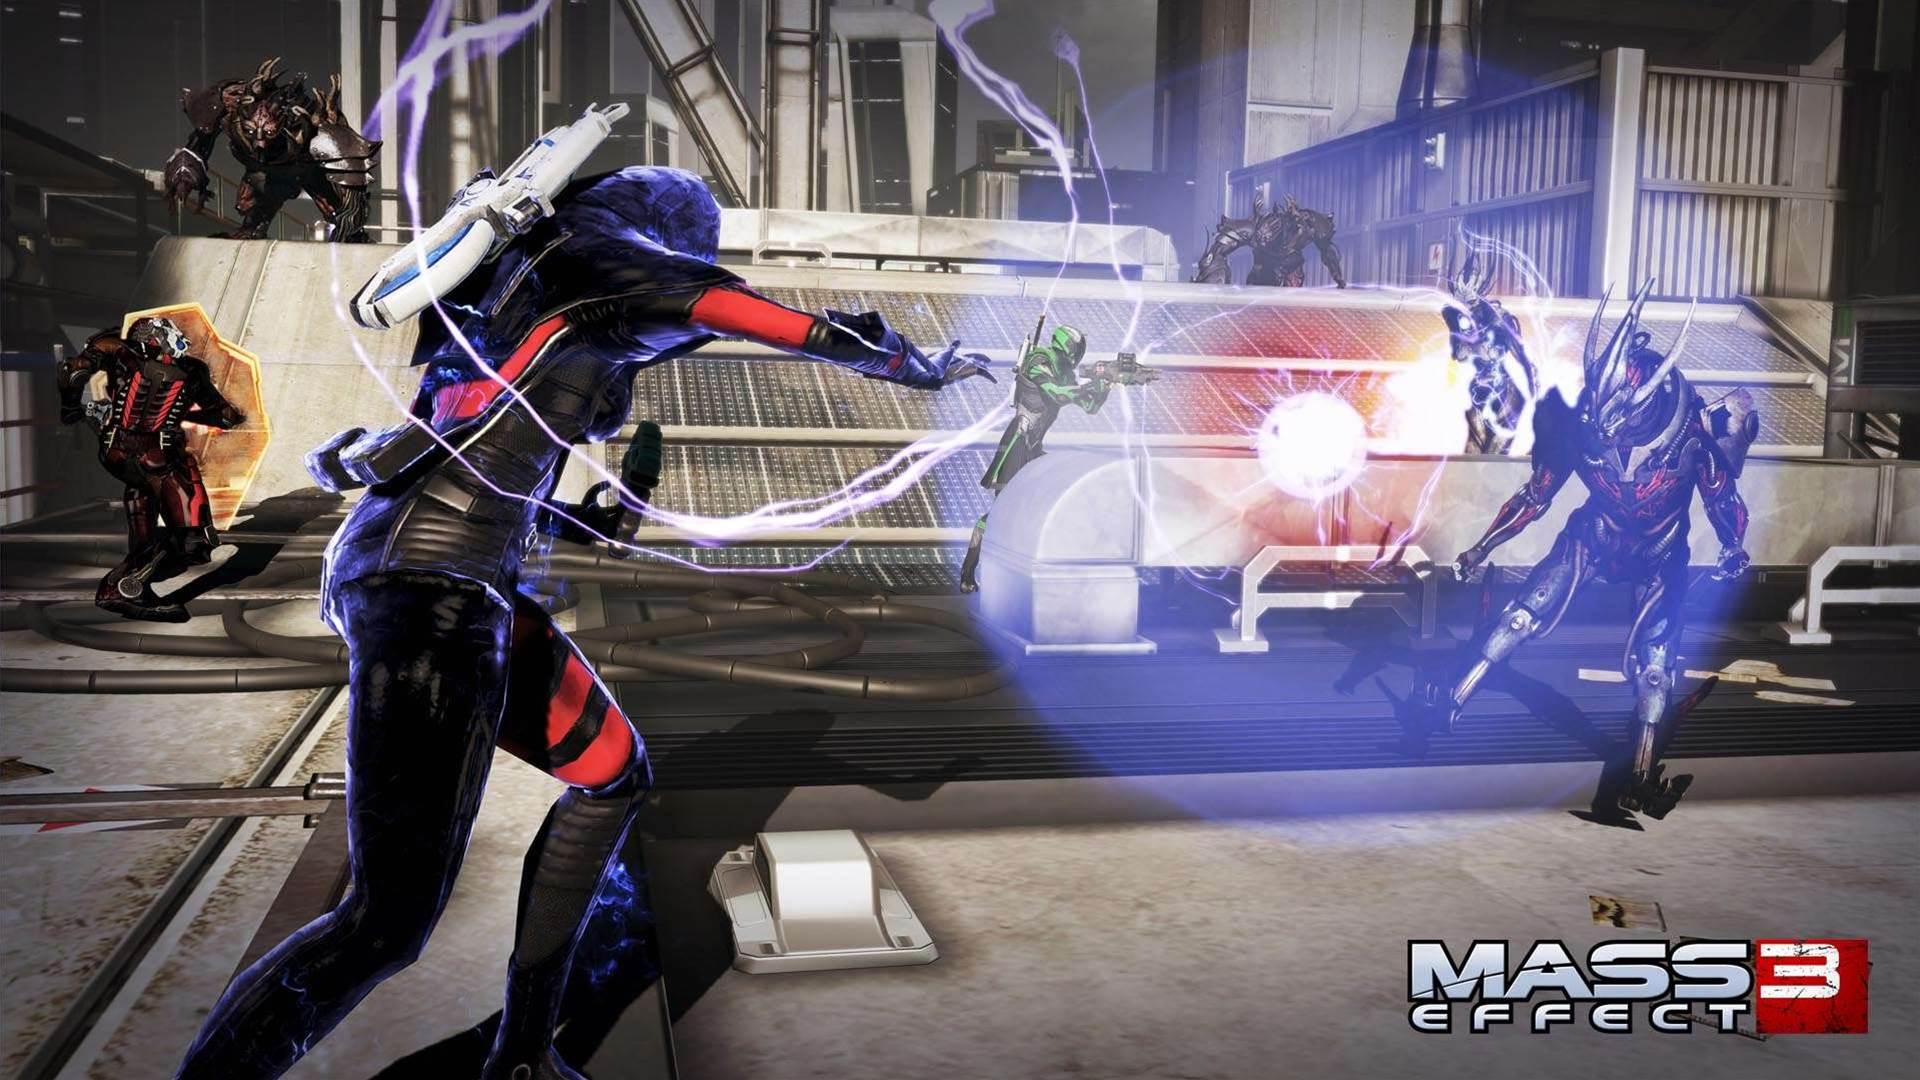 Mass Effect 3: Earth screens